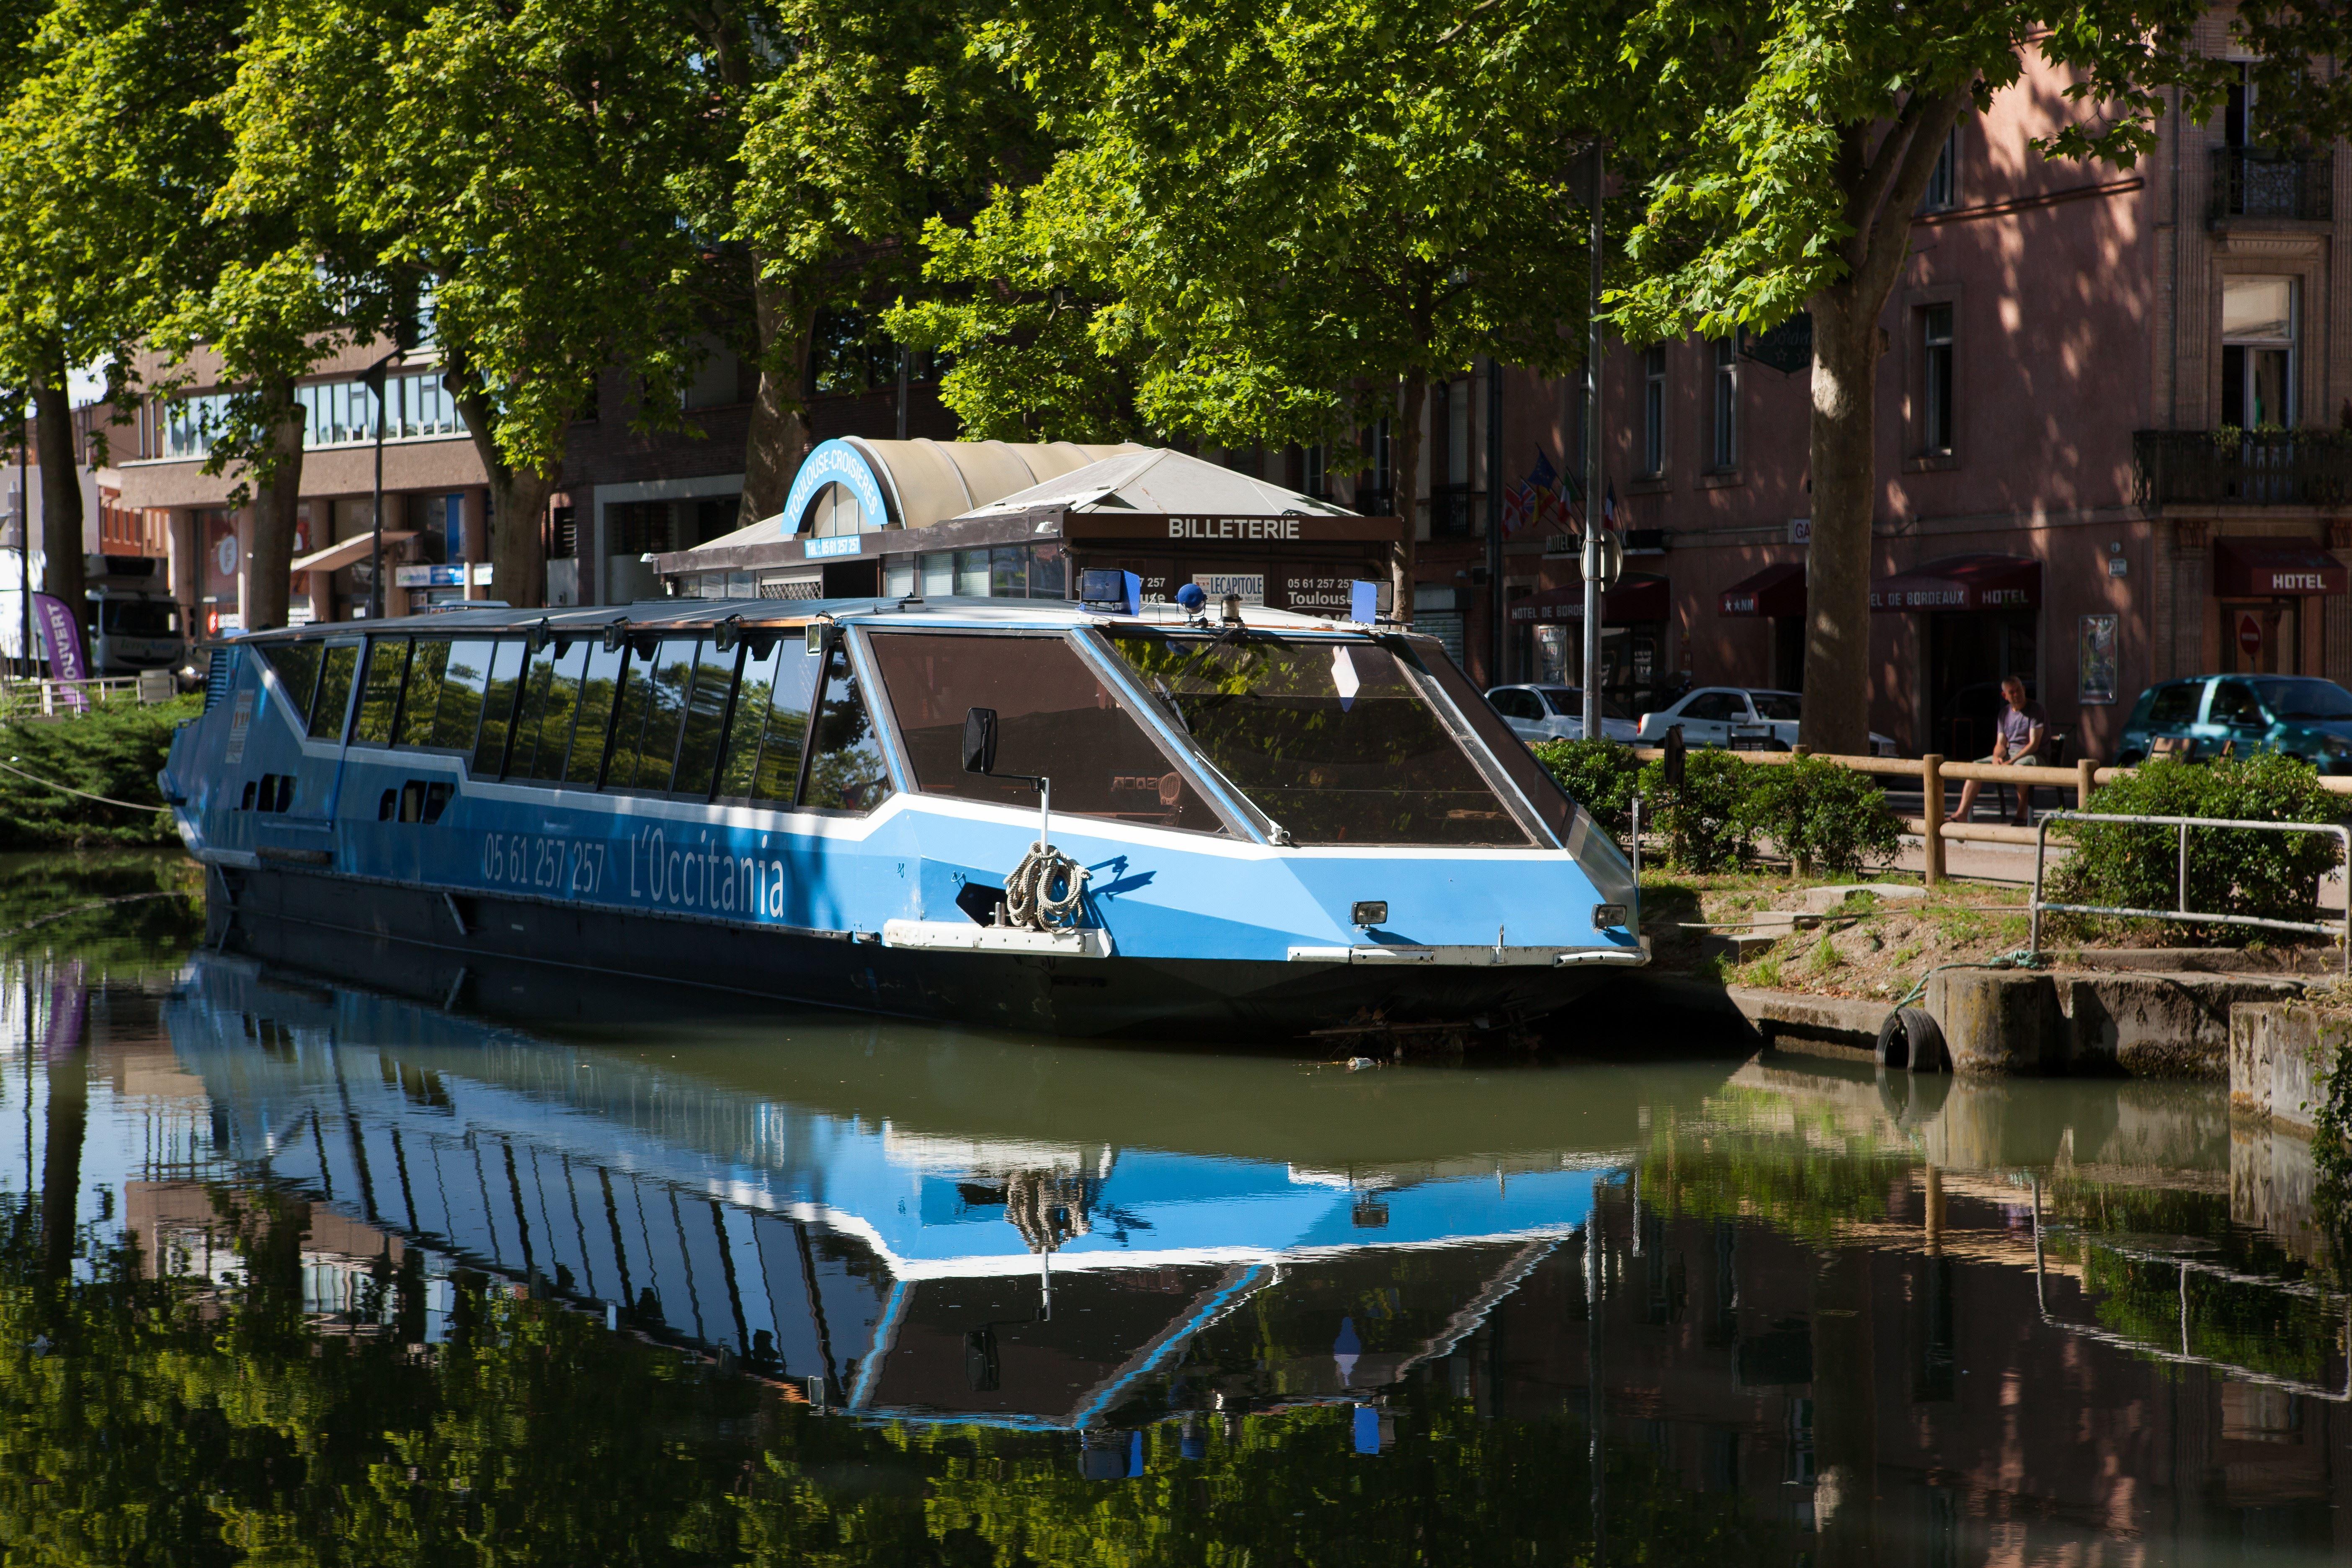 L'Occitania – Kreuzfahrtschiff mit Restaurant